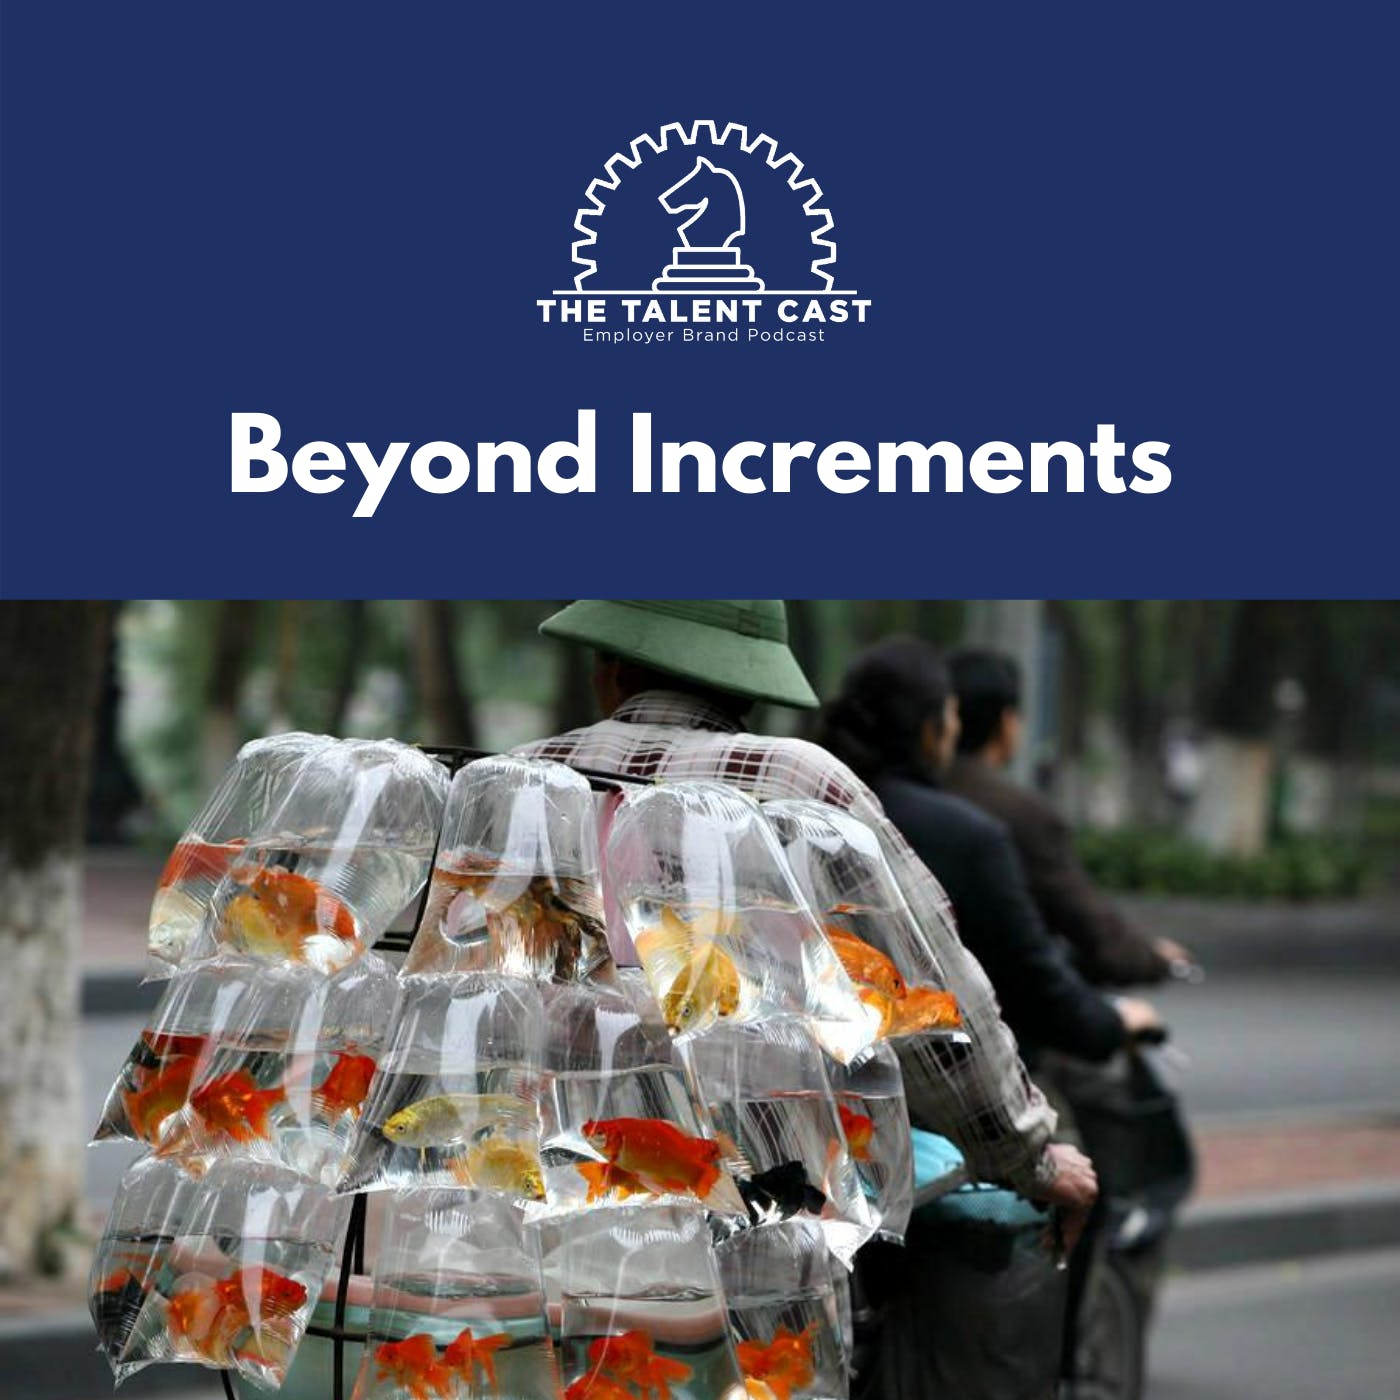 Beyond Increments